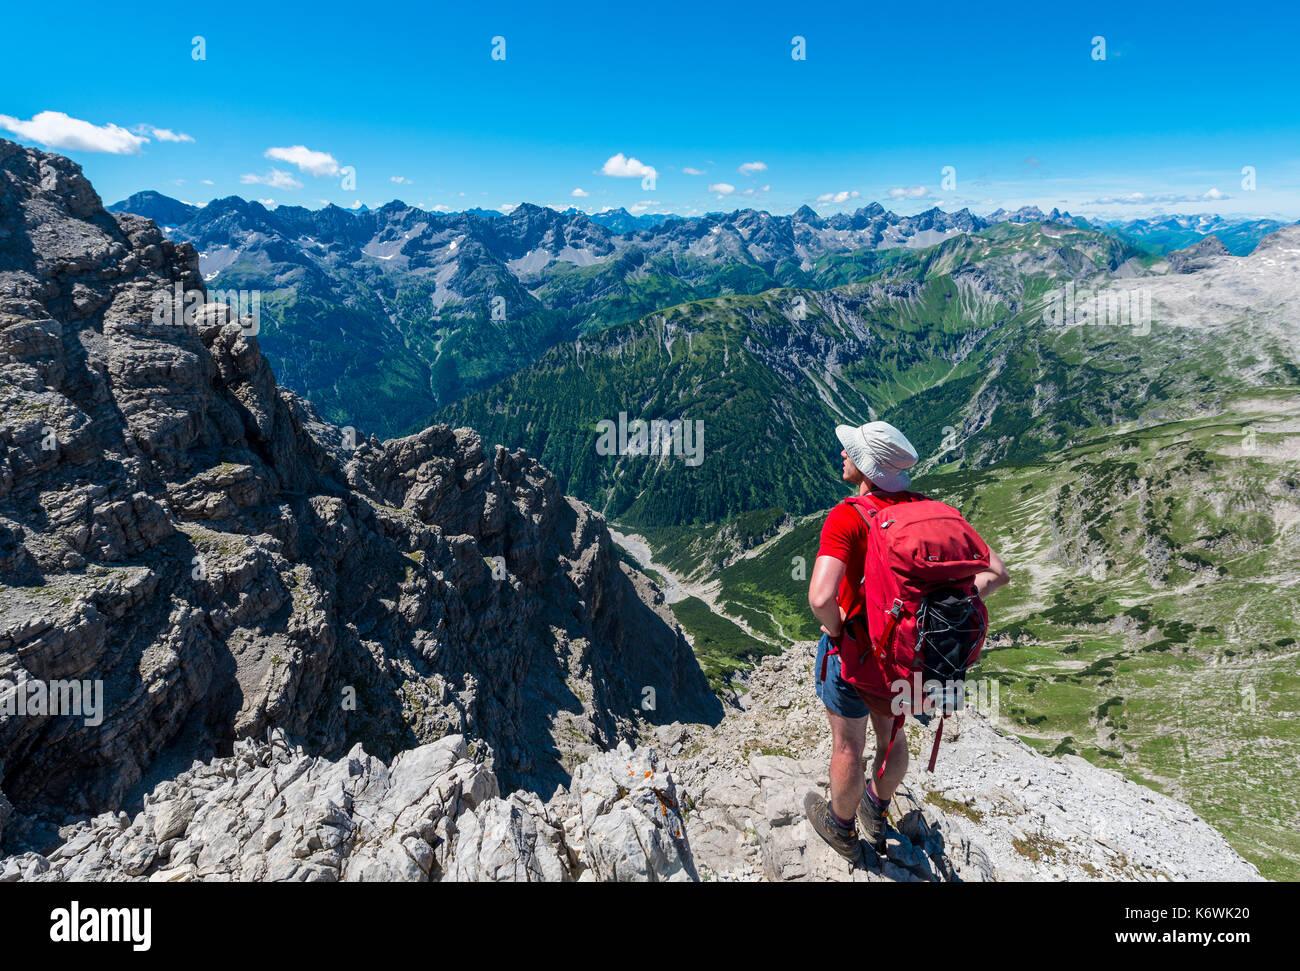 Walker overlooks mountains and Alps, hiking trail to the Hochvogel, Allgäu, Allgäuer Hochalpen, Bavaria, Germany - Stock Image